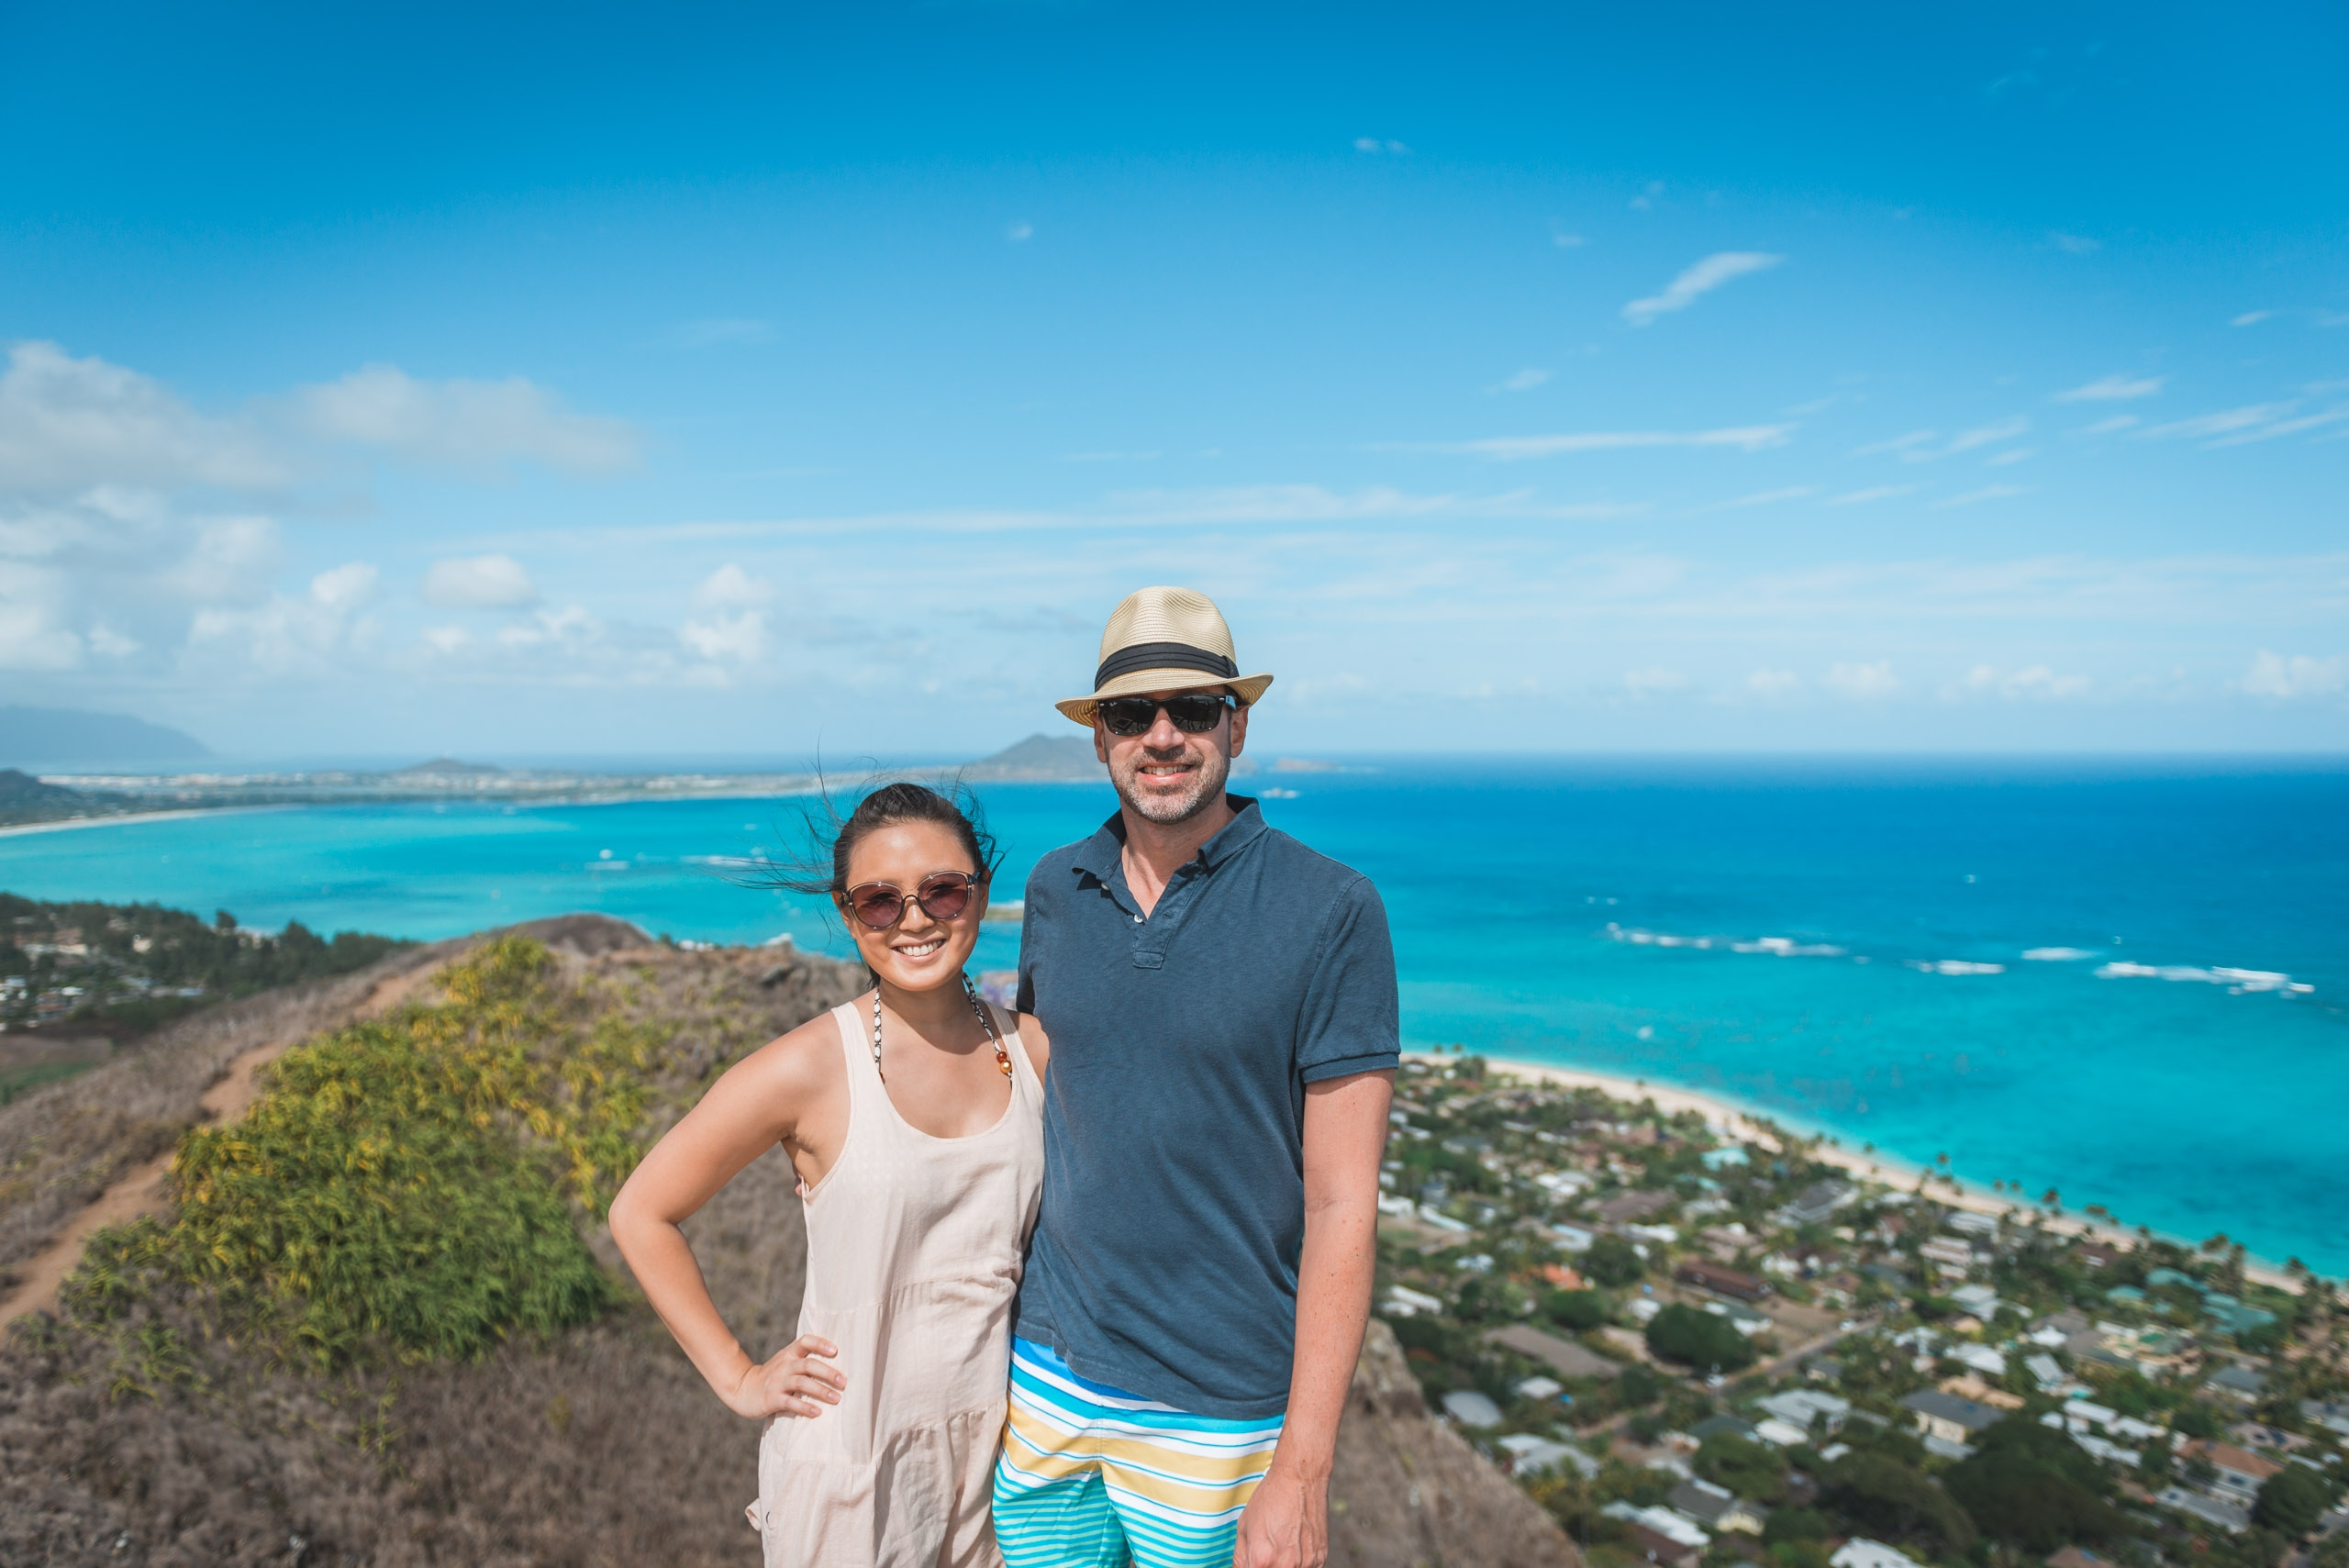 Jessica & Kris Atop the Pillbox Trail - Wide